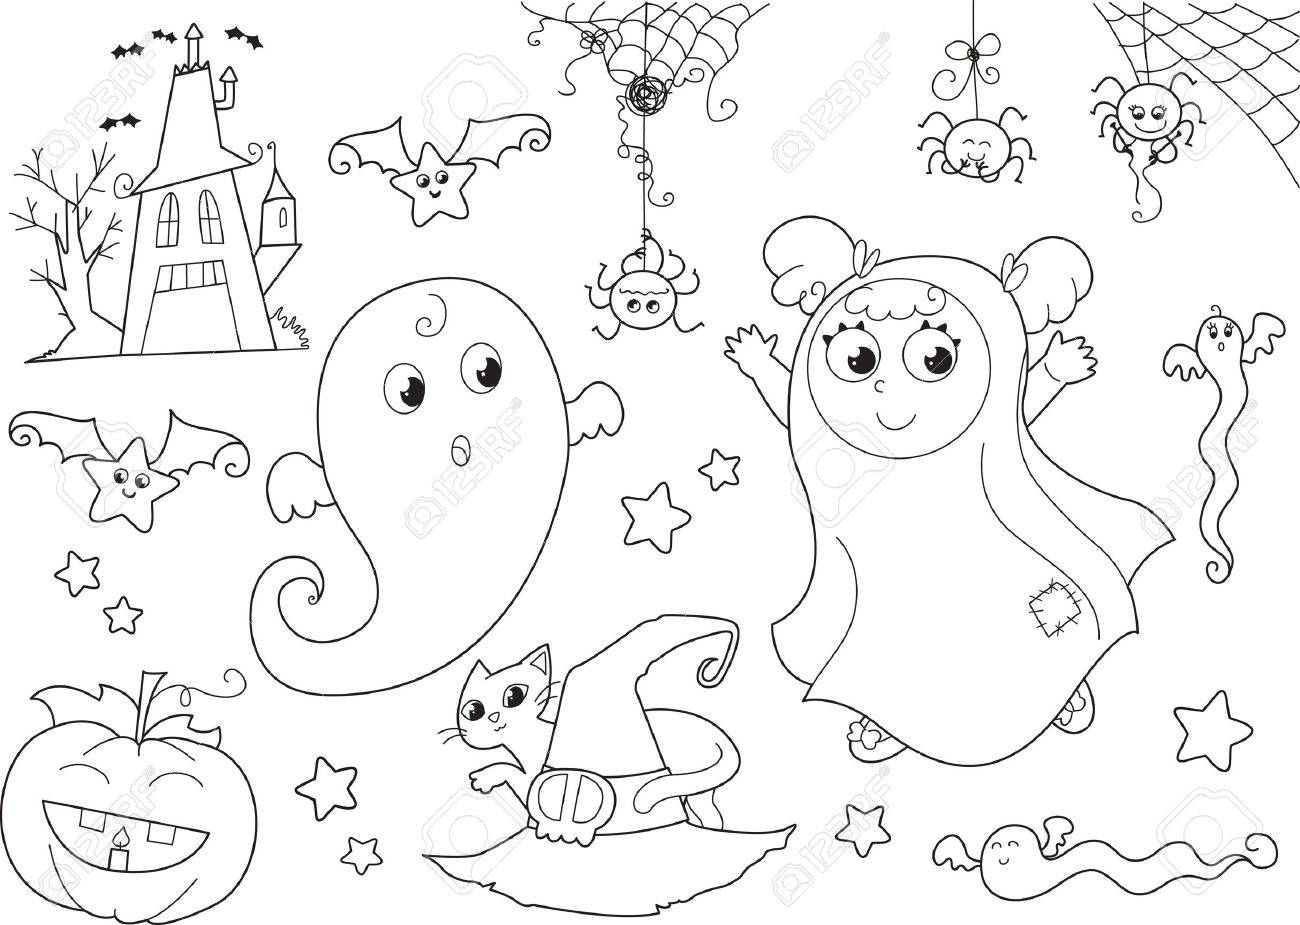 Dibujos De Halloween Establecer Fantasmas Lindo, Chica Enmascarada ...